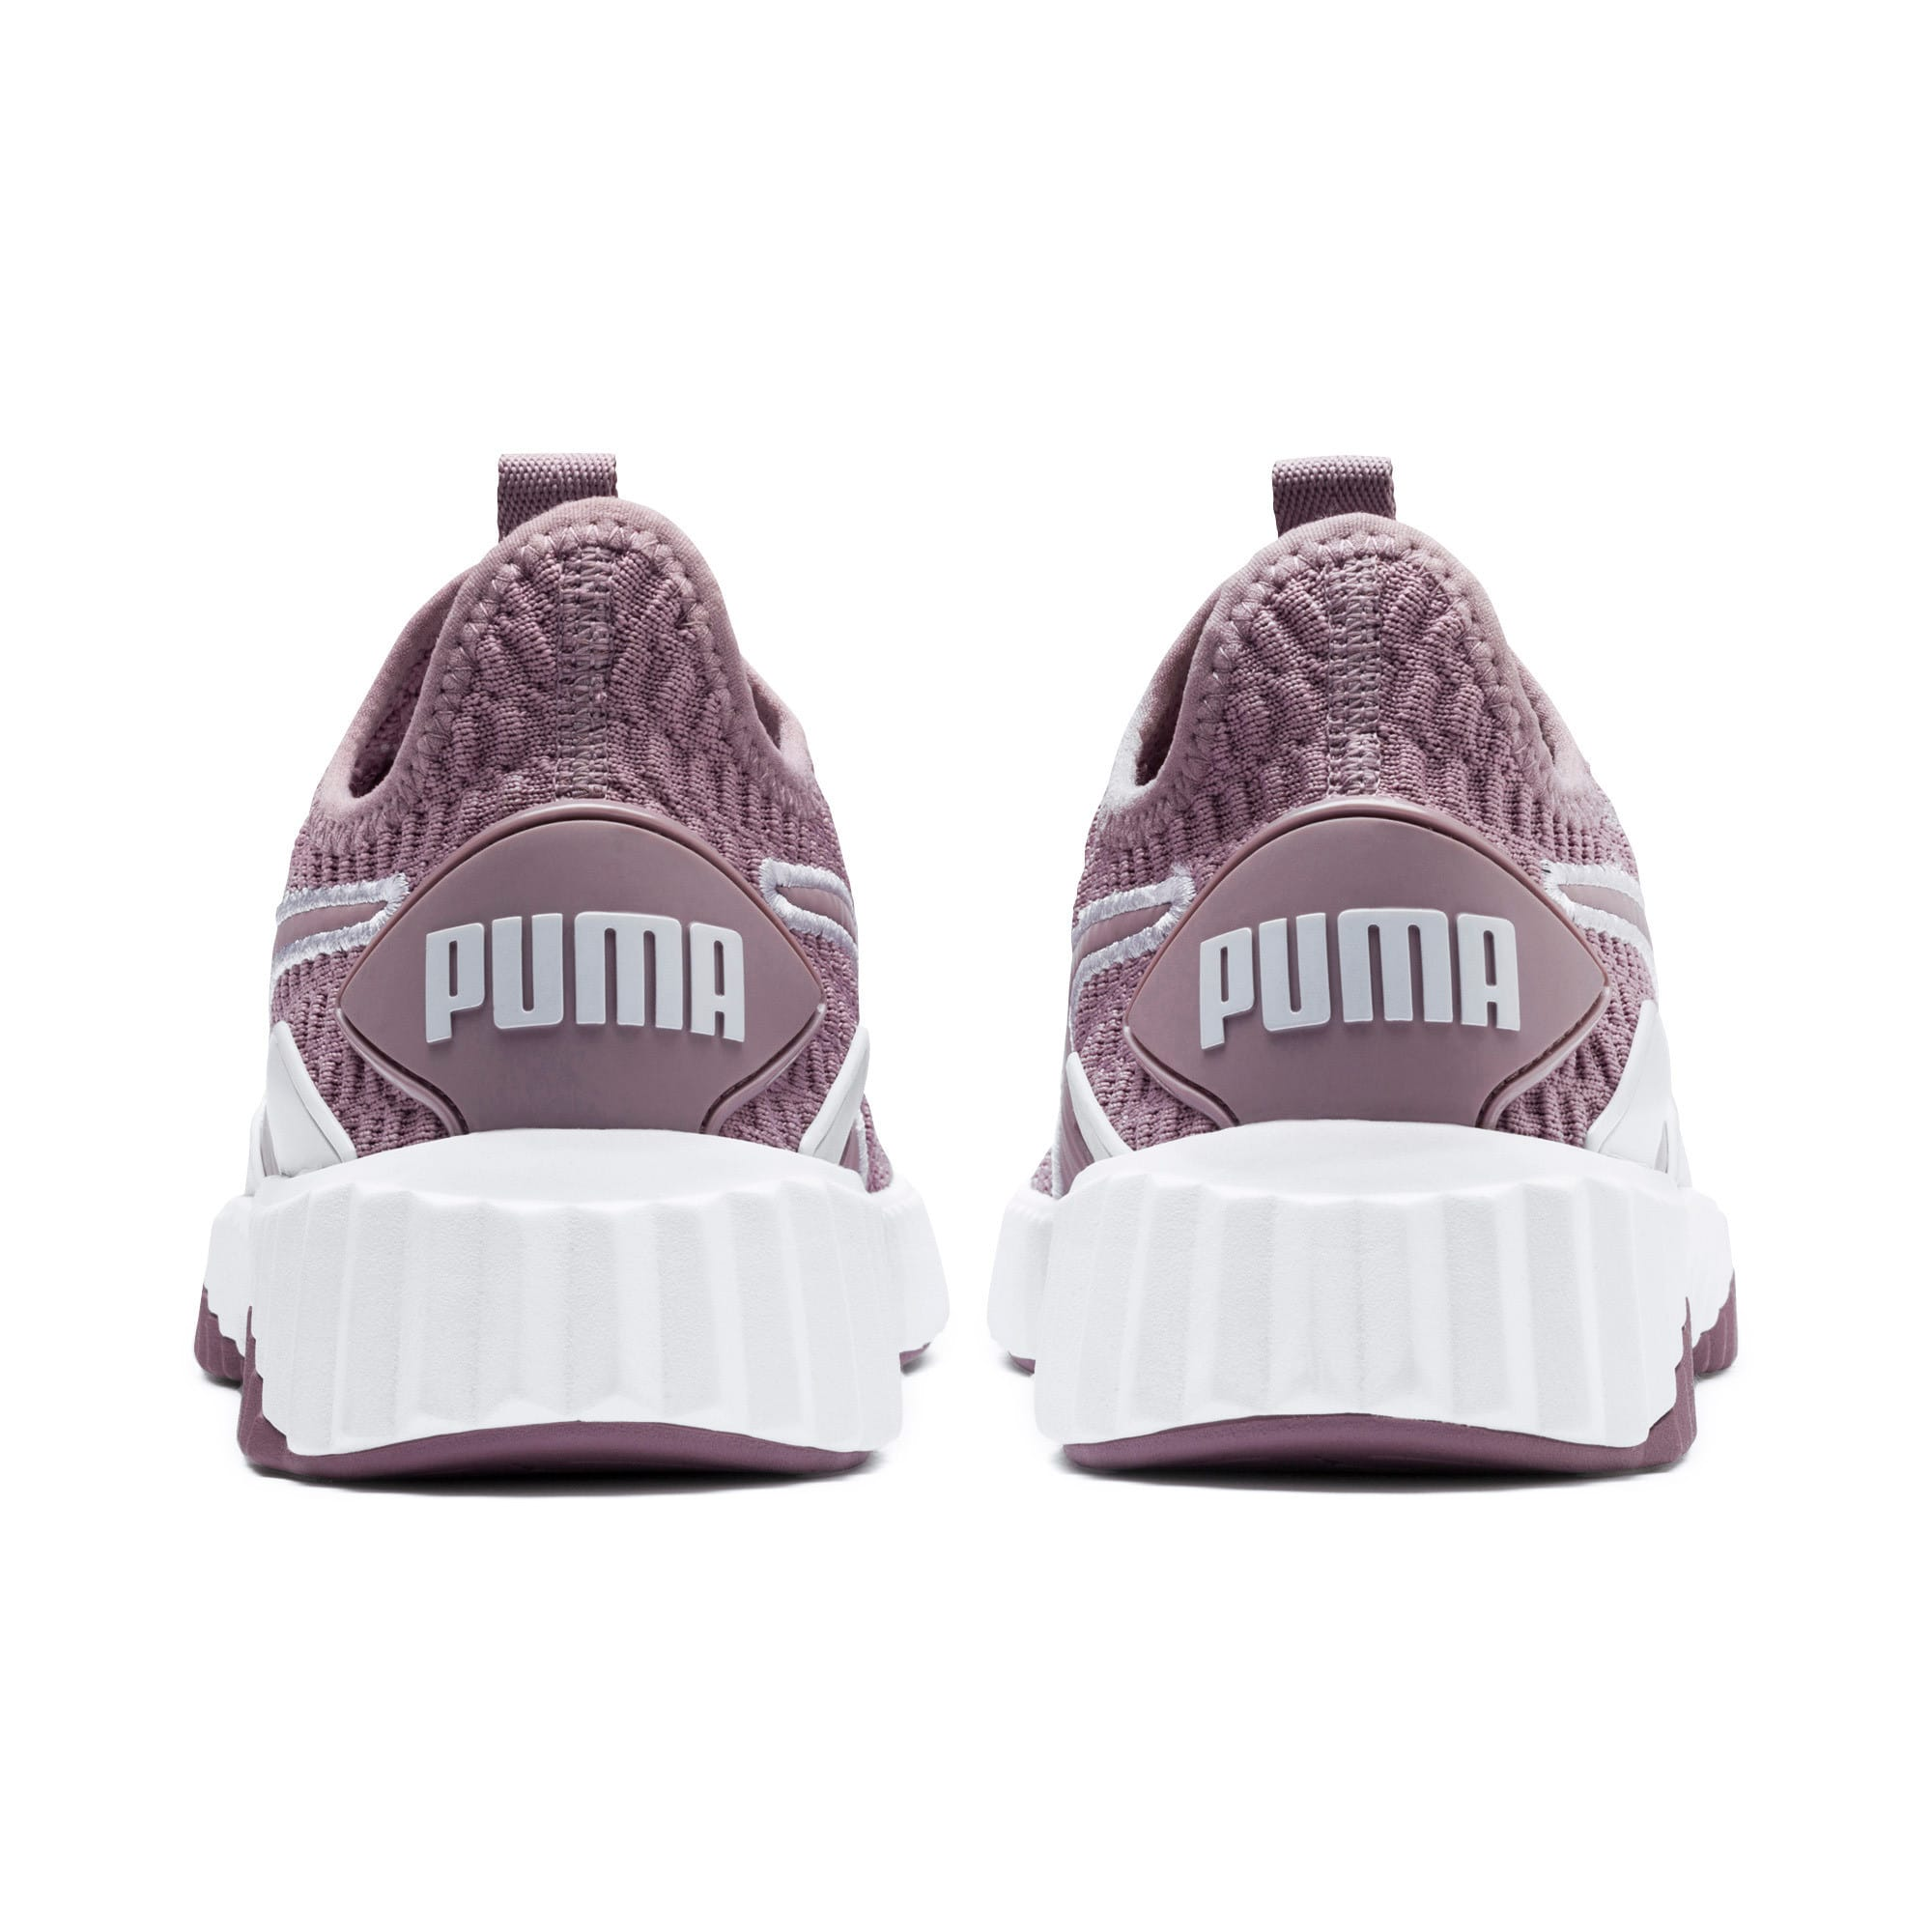 Thumbnail 4 of Defy Women's Training Shoes, Elderberry-Puma White, medium